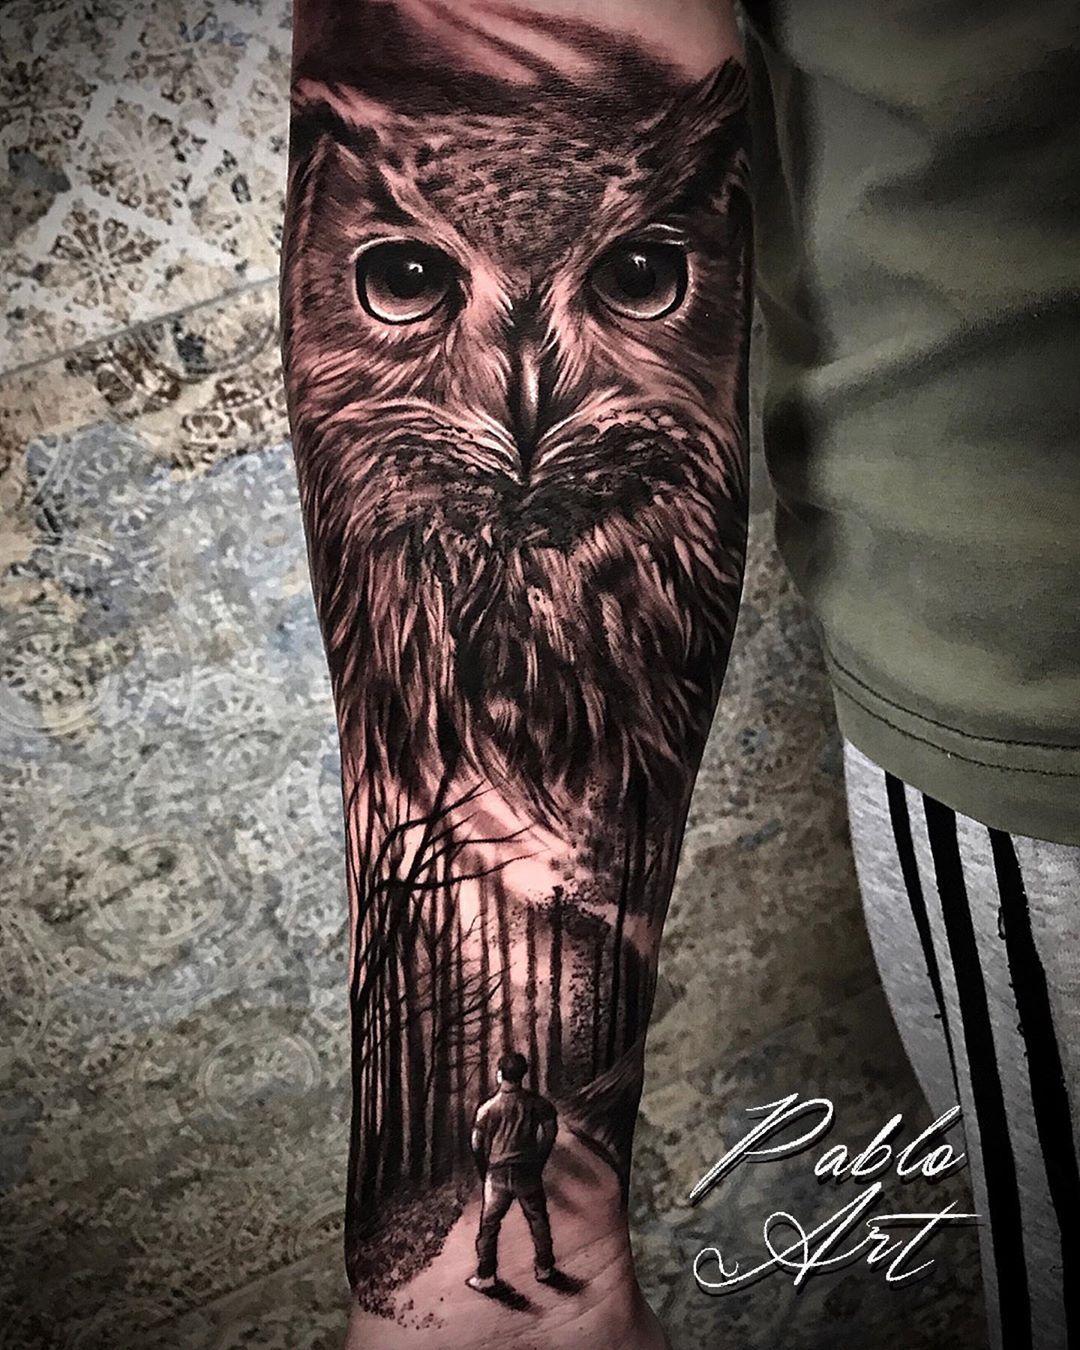 #buho #buhotattoo #owl #owltattoo #forestal #tatuajes #tatuagens #tattoosociety #tattoolifestyle #tattooworld #tattoolovers #tattoosleeves #tattoosociety #valenciatattoo #tattoovalencia #instatattoos #valencia #alzira #alziratattoo #pabloart #lagalerianegra #tattooestudio